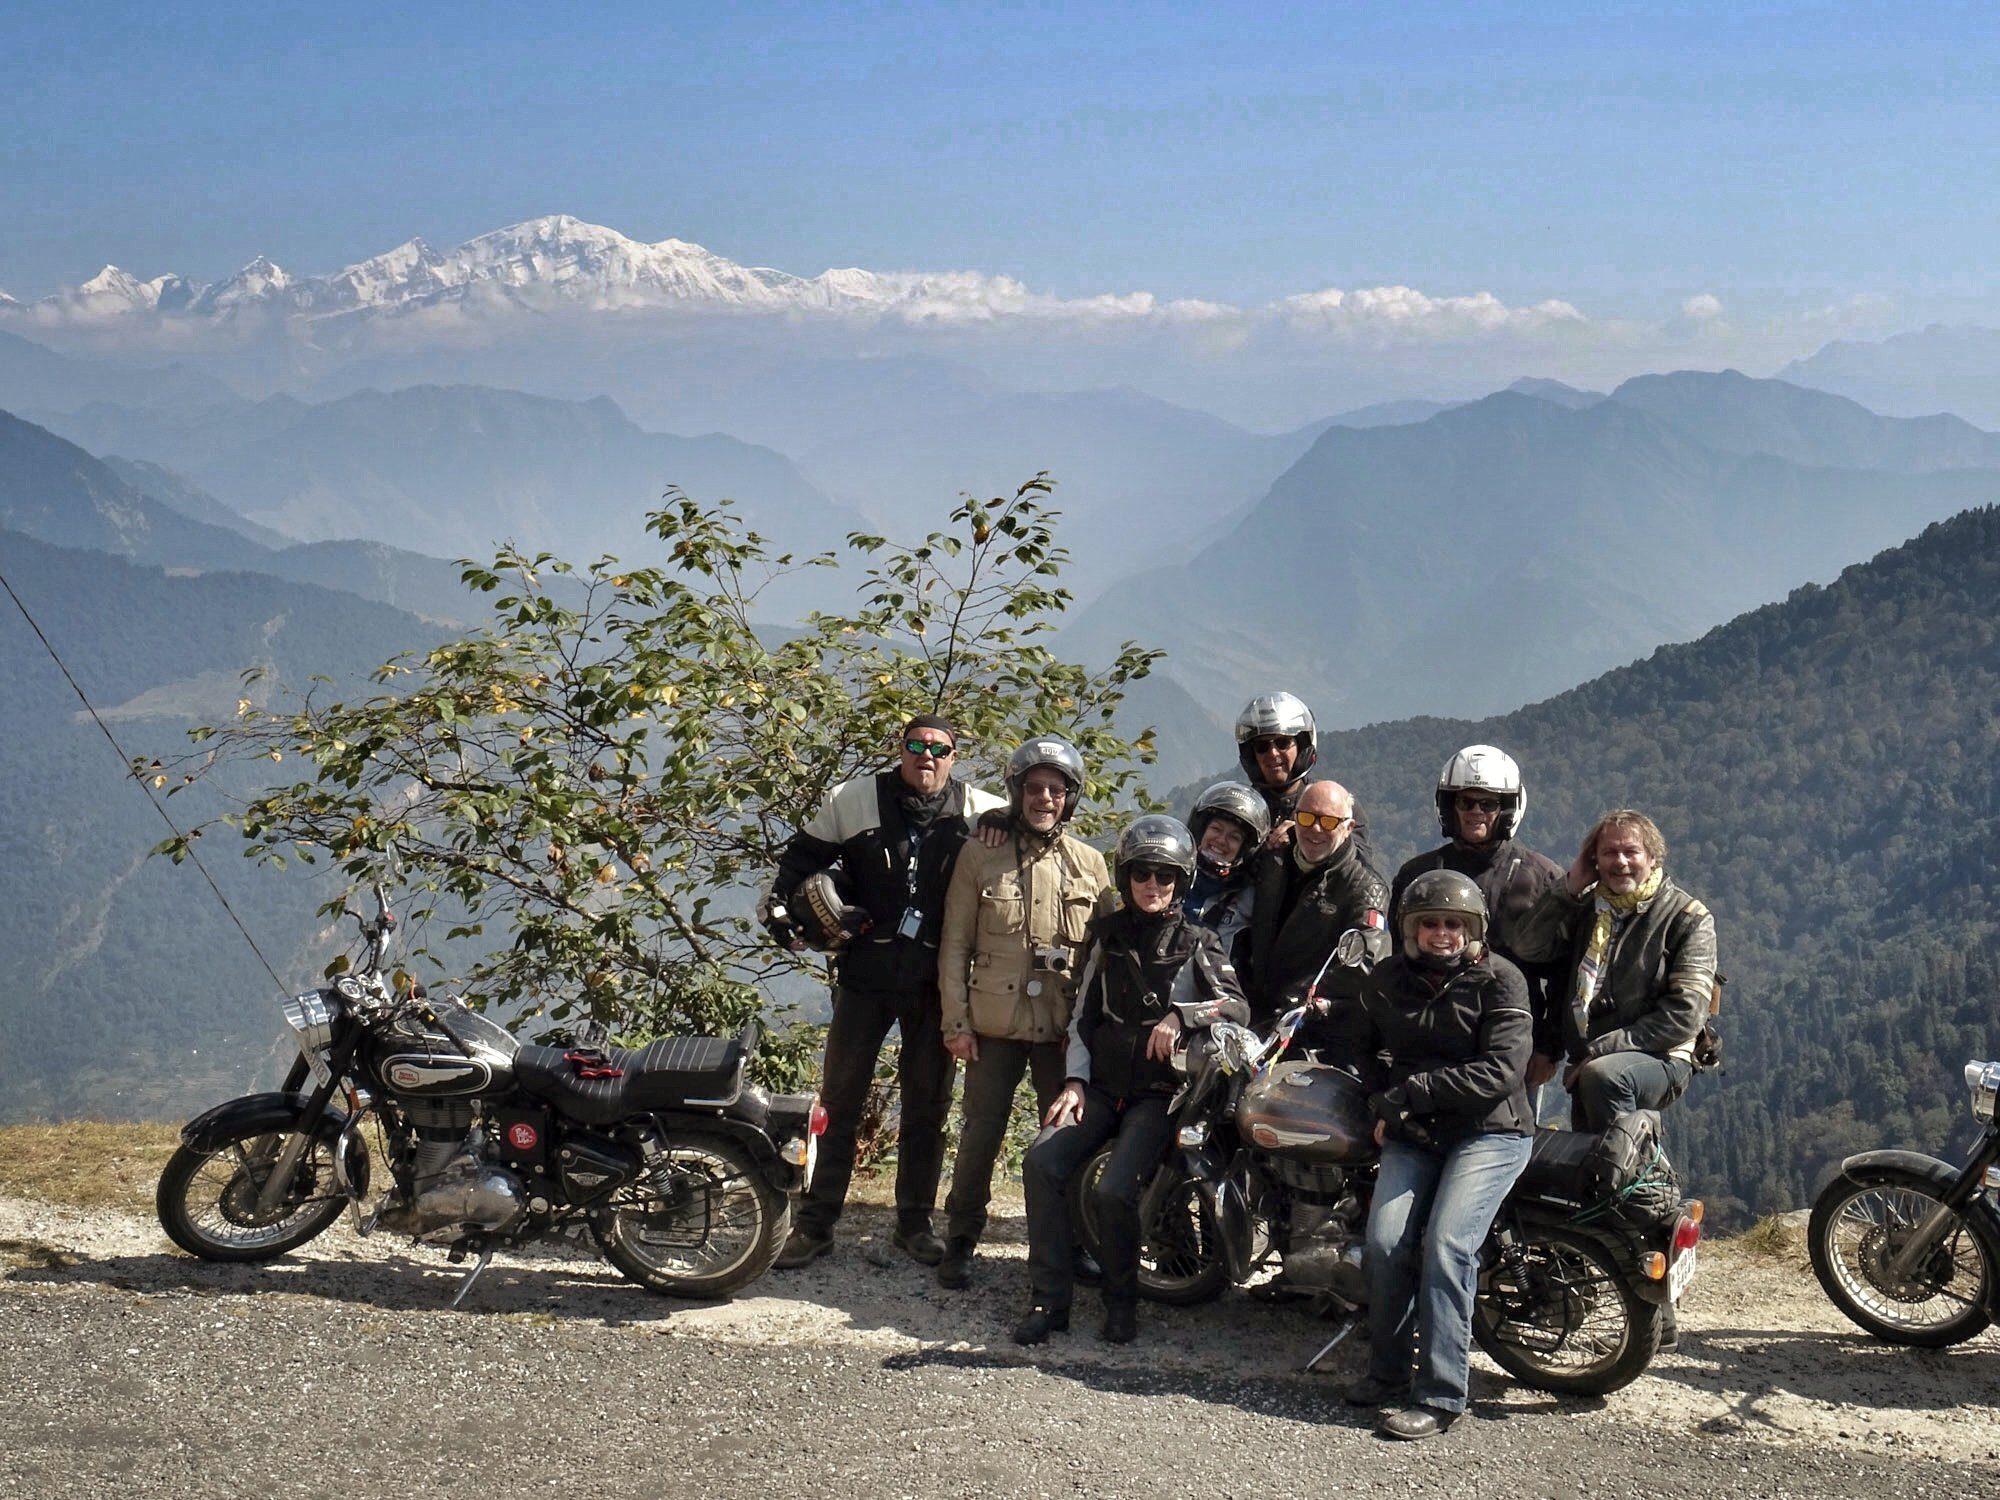 Motorrad-Roadtrip Himalaya - Chic & Charme in Uttarakhand